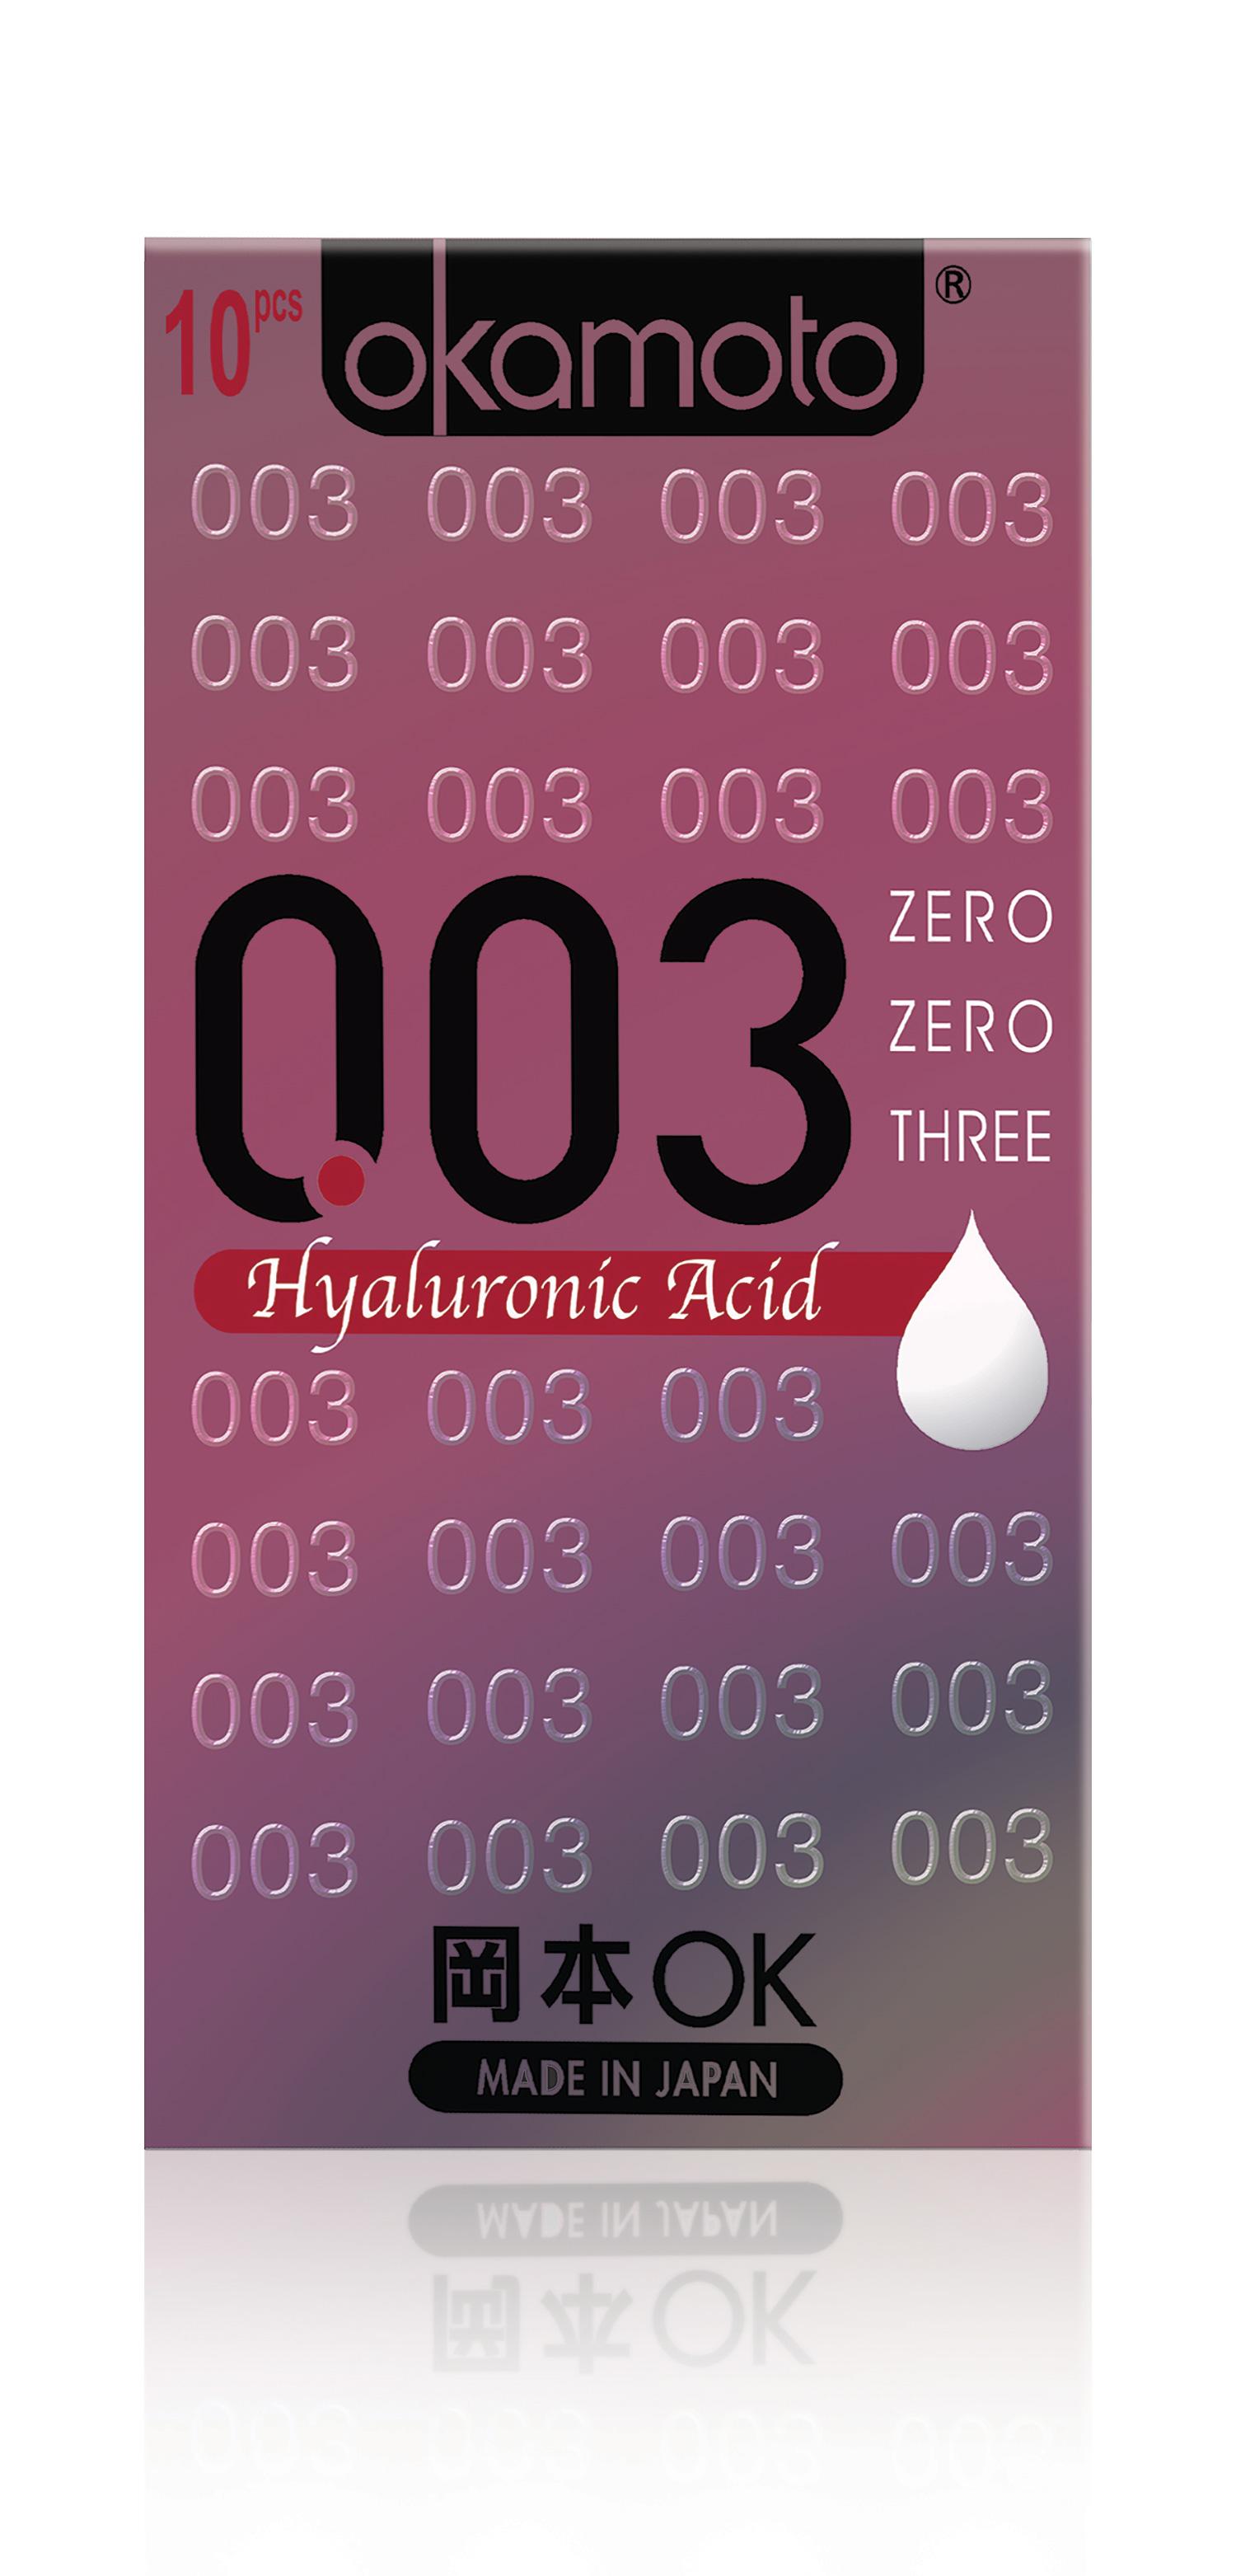 Hyaluronic-Acid-_FRONT